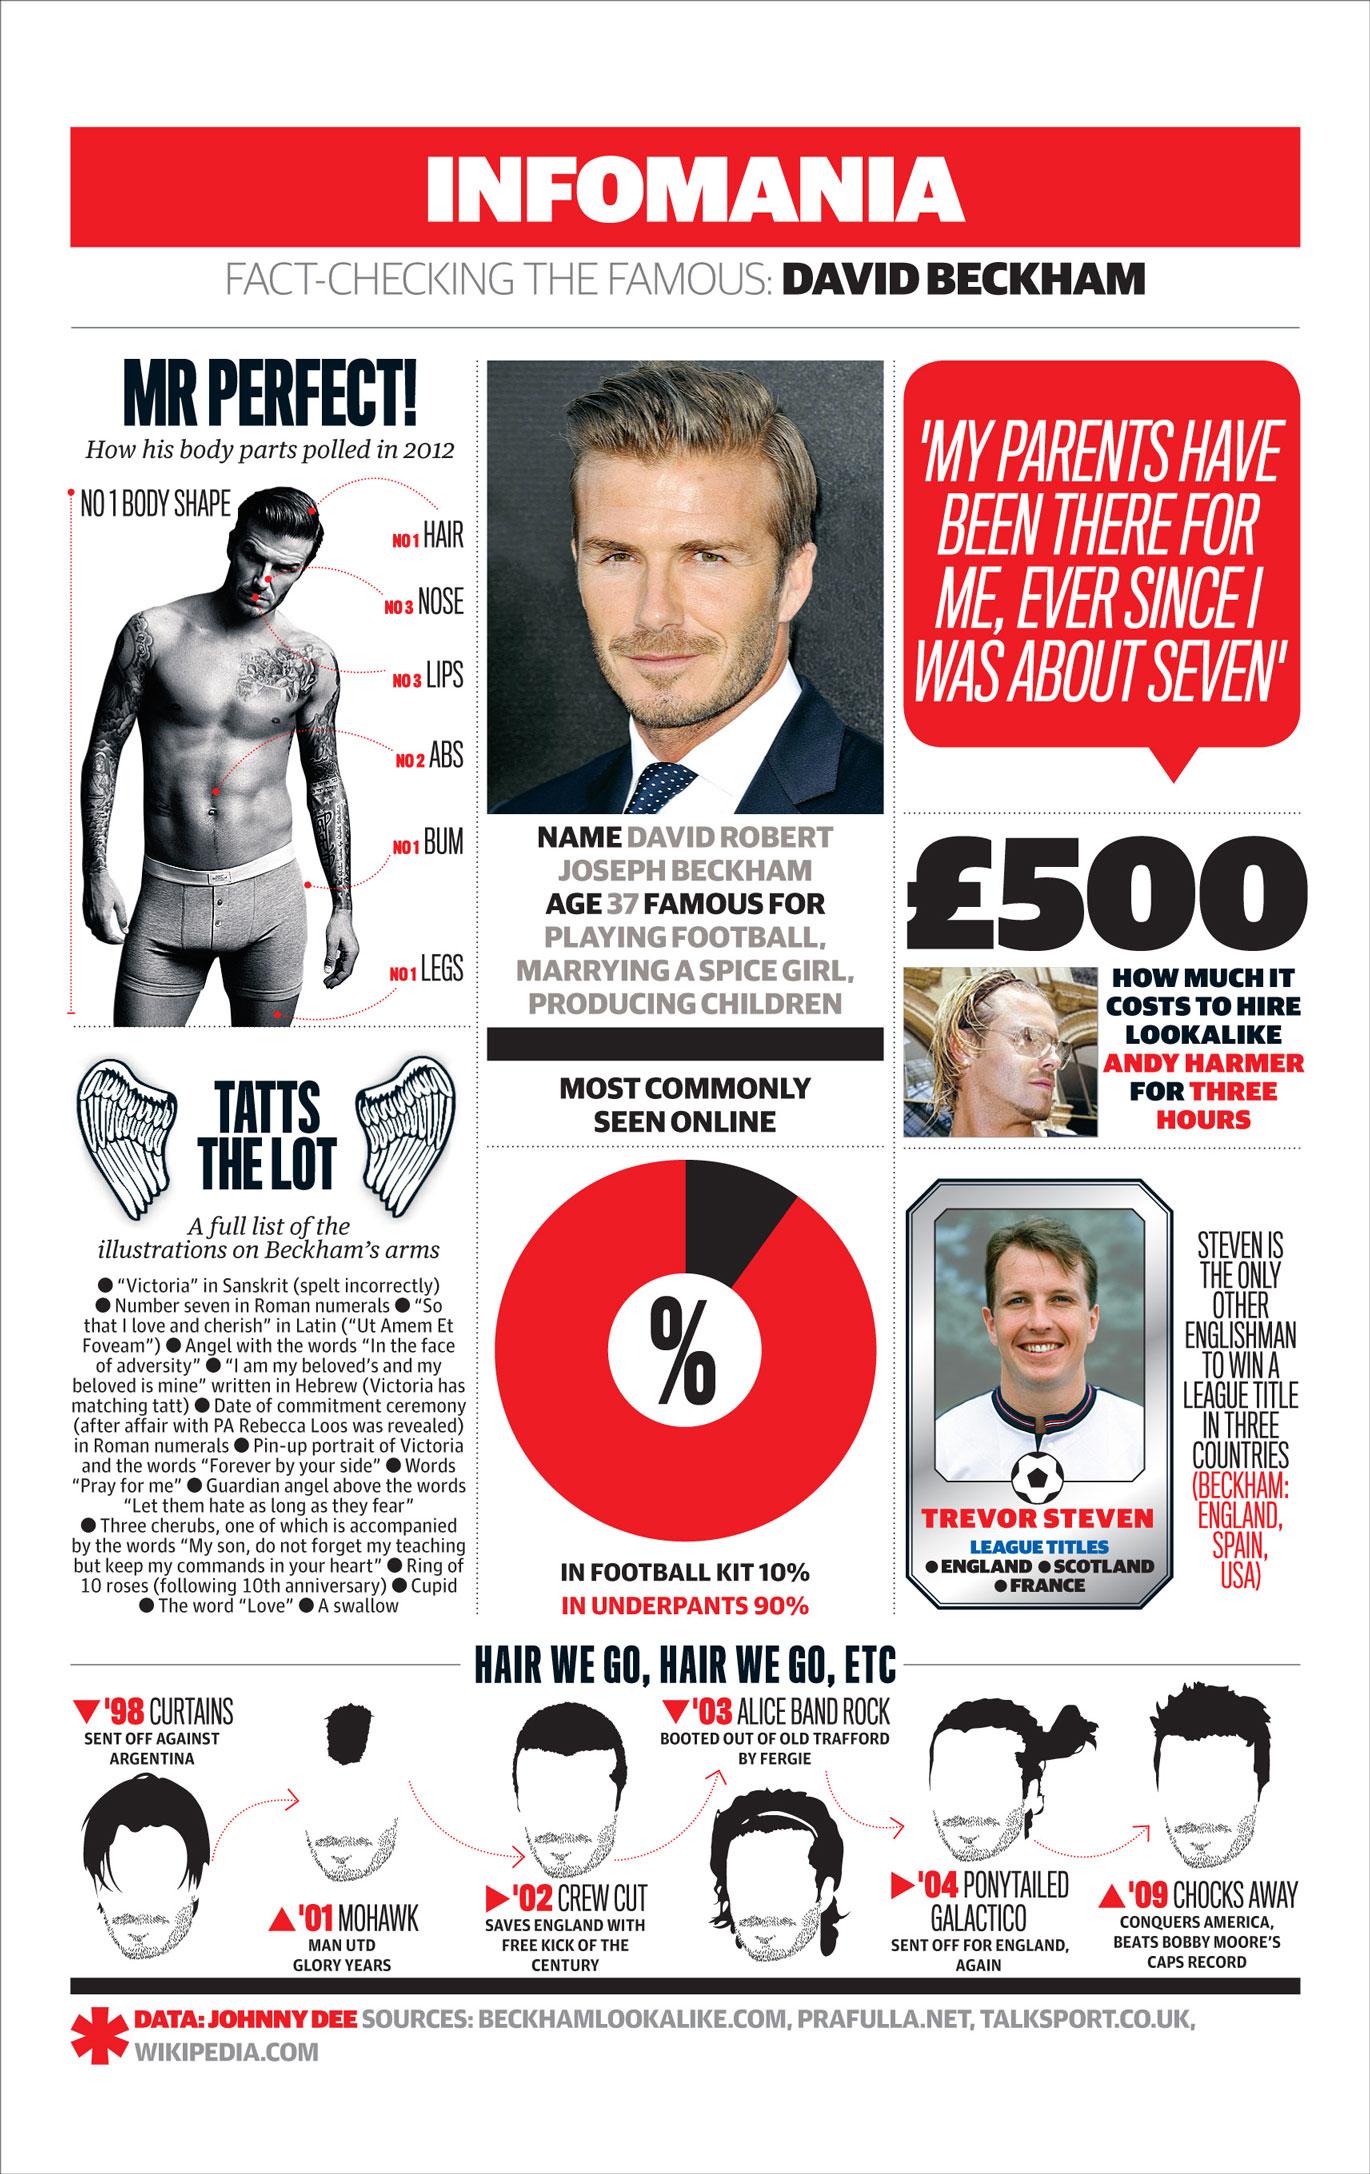 Lights on David Beckham-Infographic